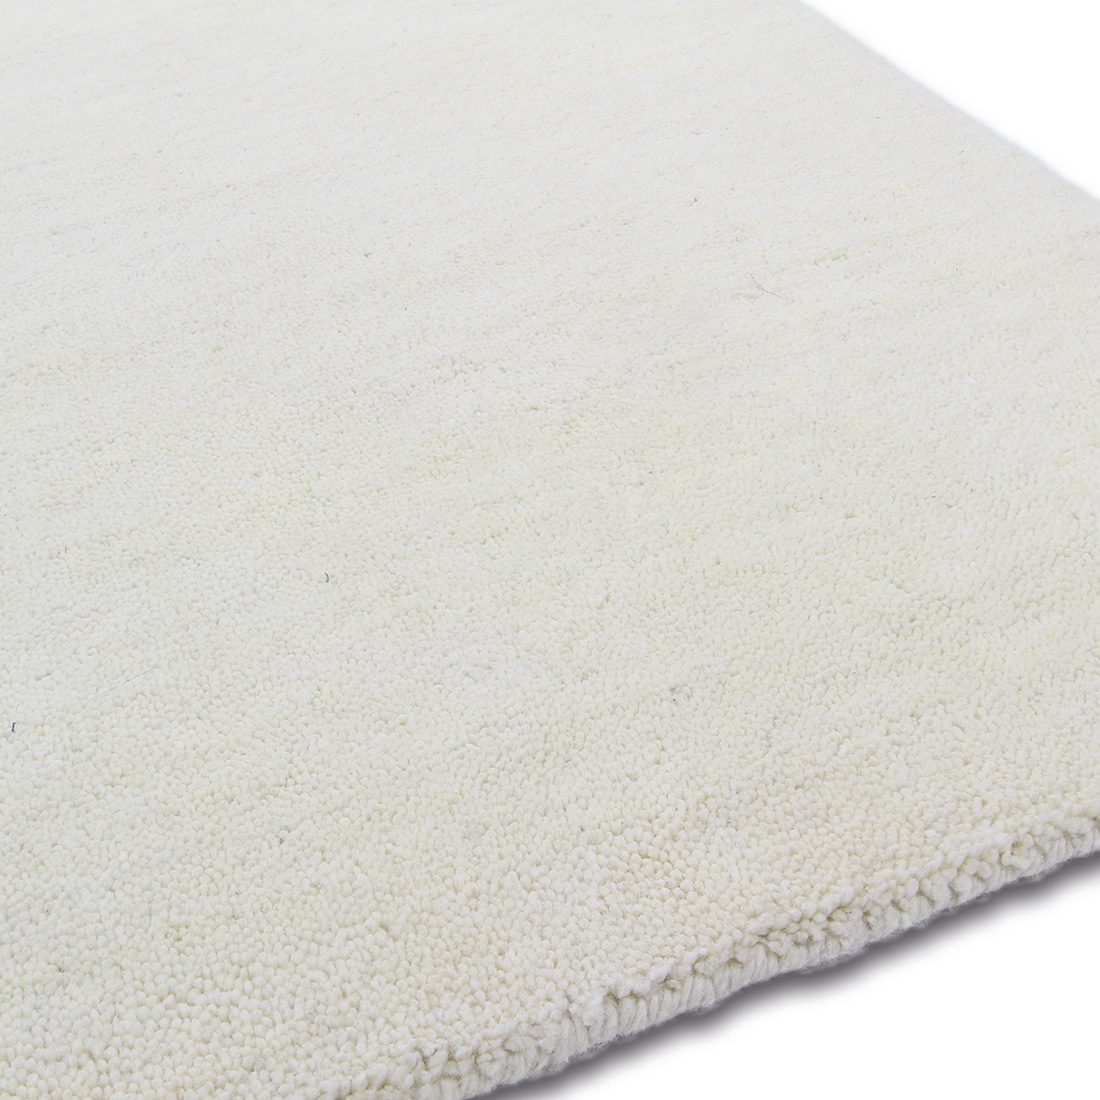 Vloerkleed Brinker Nador White | 240 x 340 cm